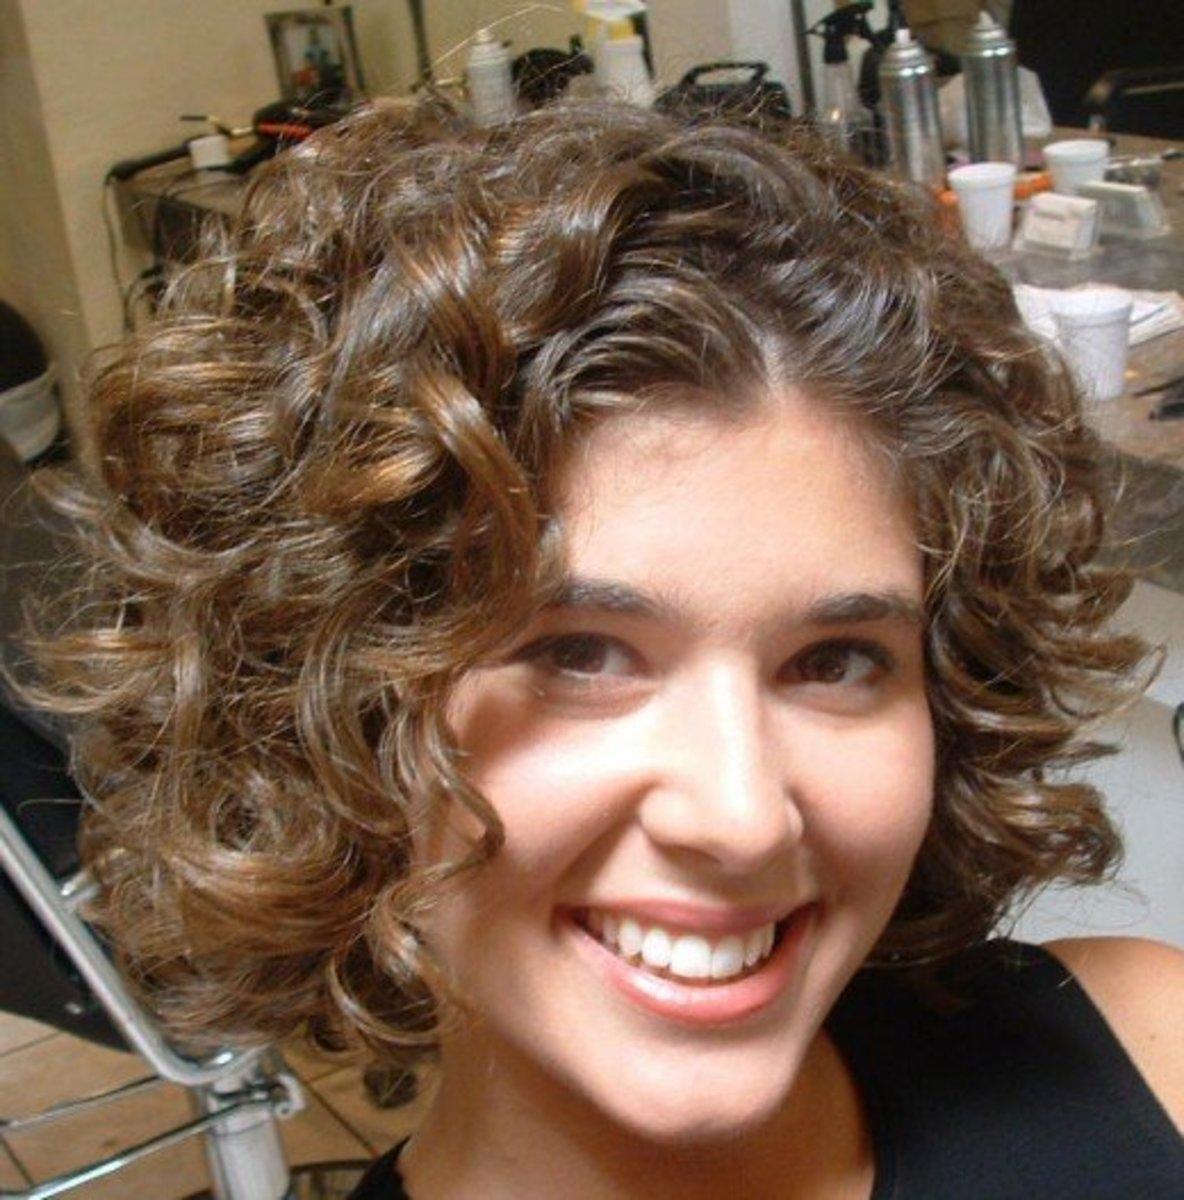 Elegant short curly hair style